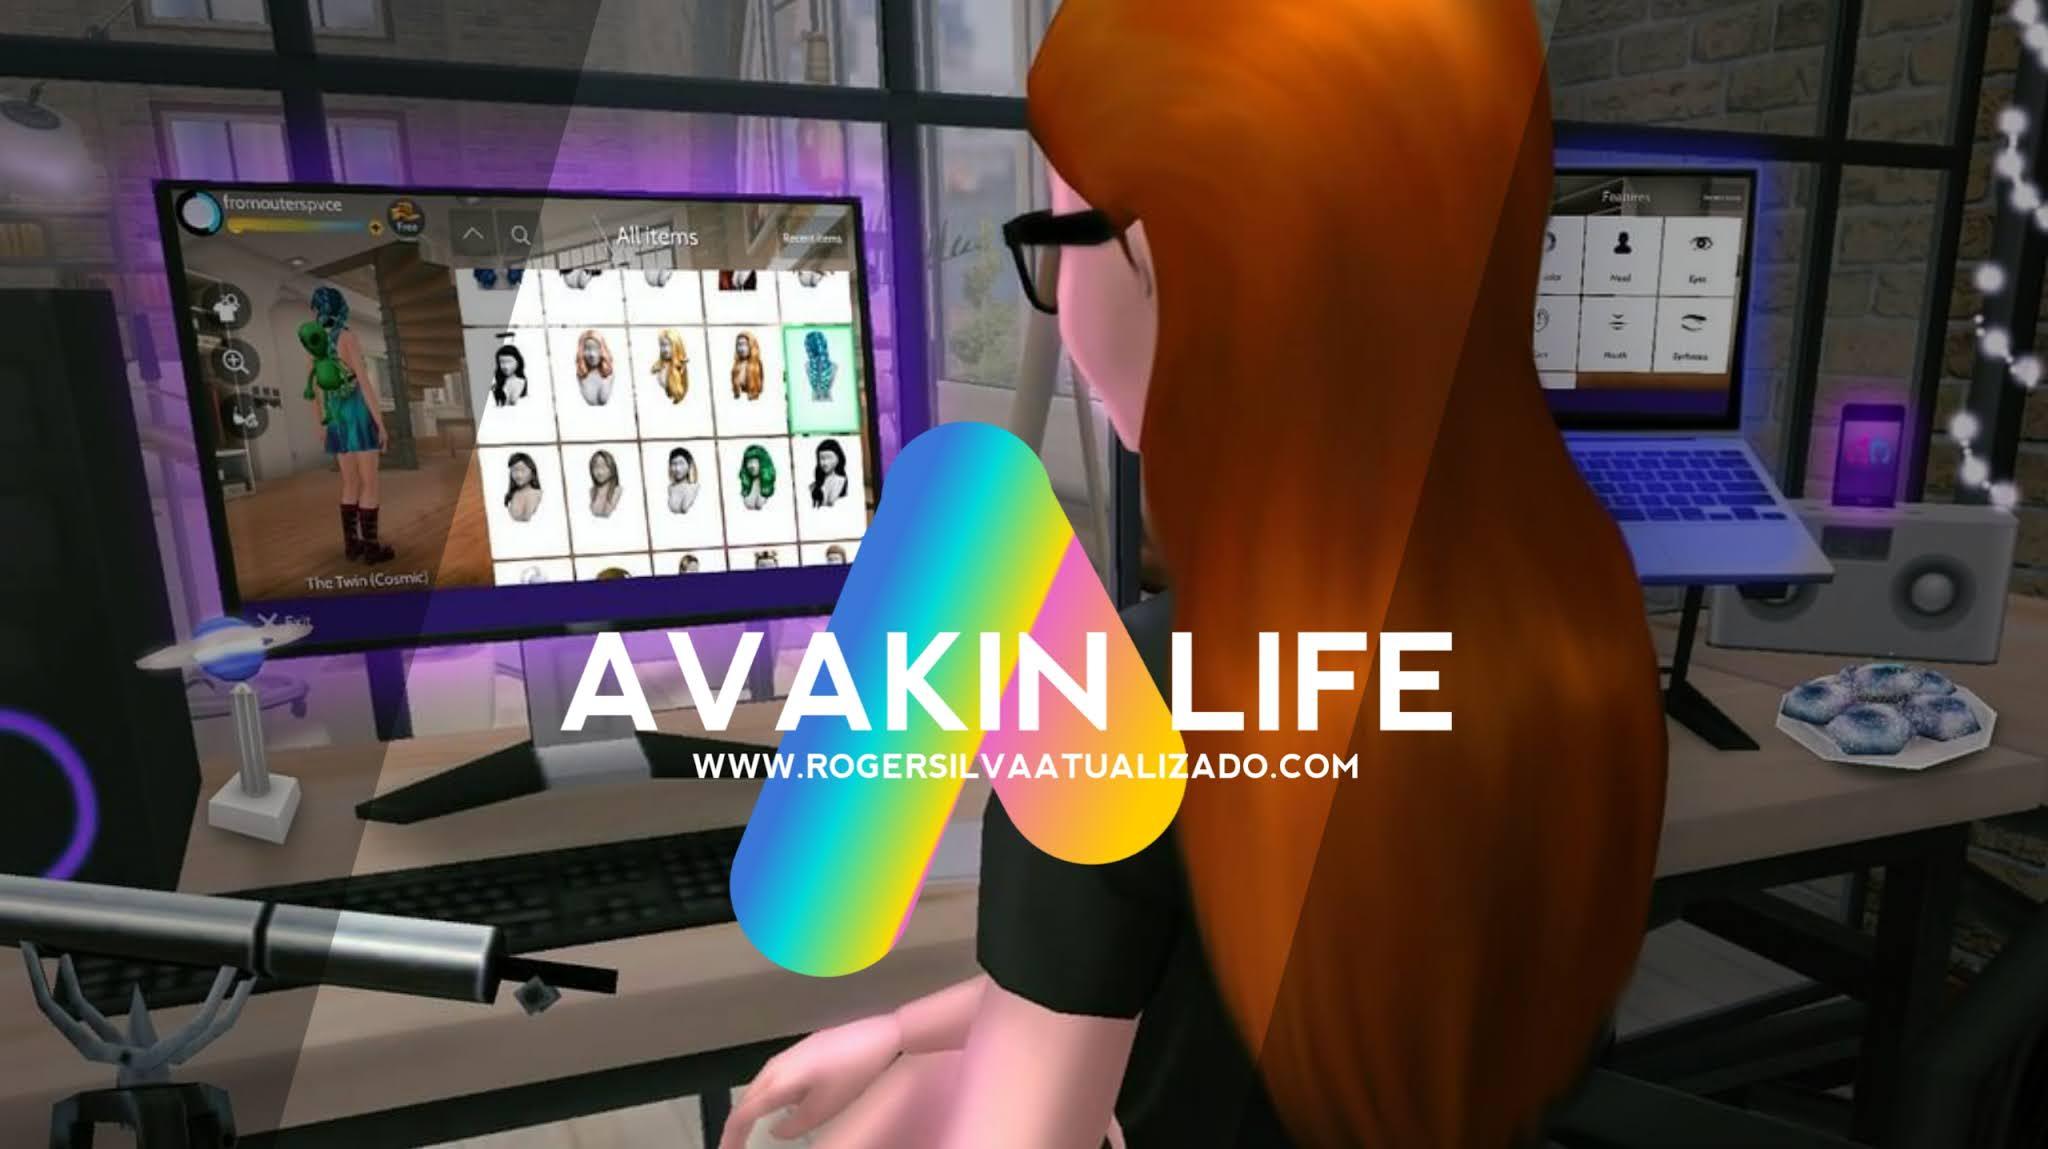 Avakin Life 1.050.05 mod menu atualizado